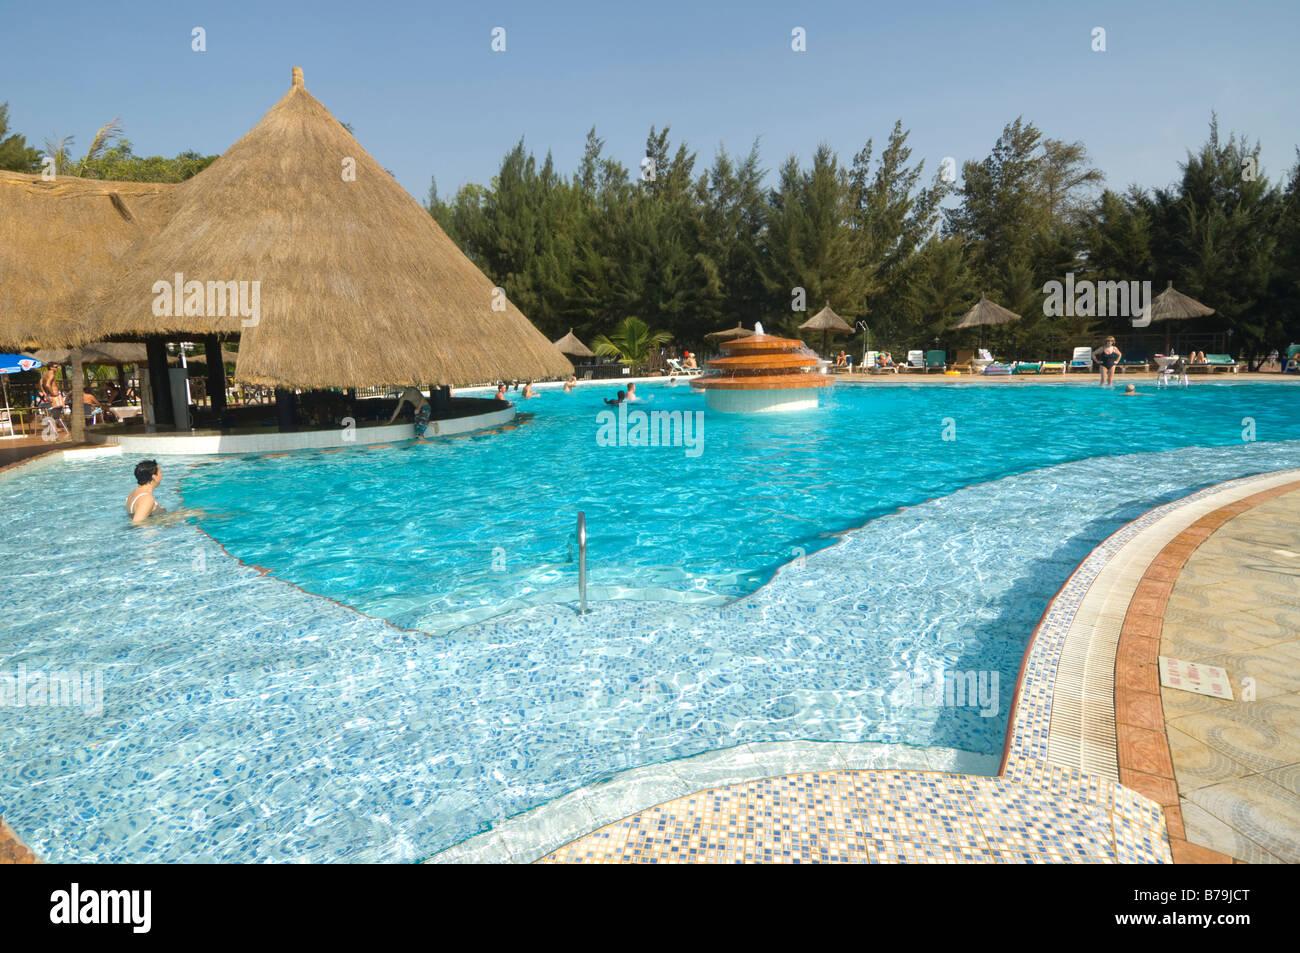 hotel-senegambia-banjul-the-gambia-B79JC